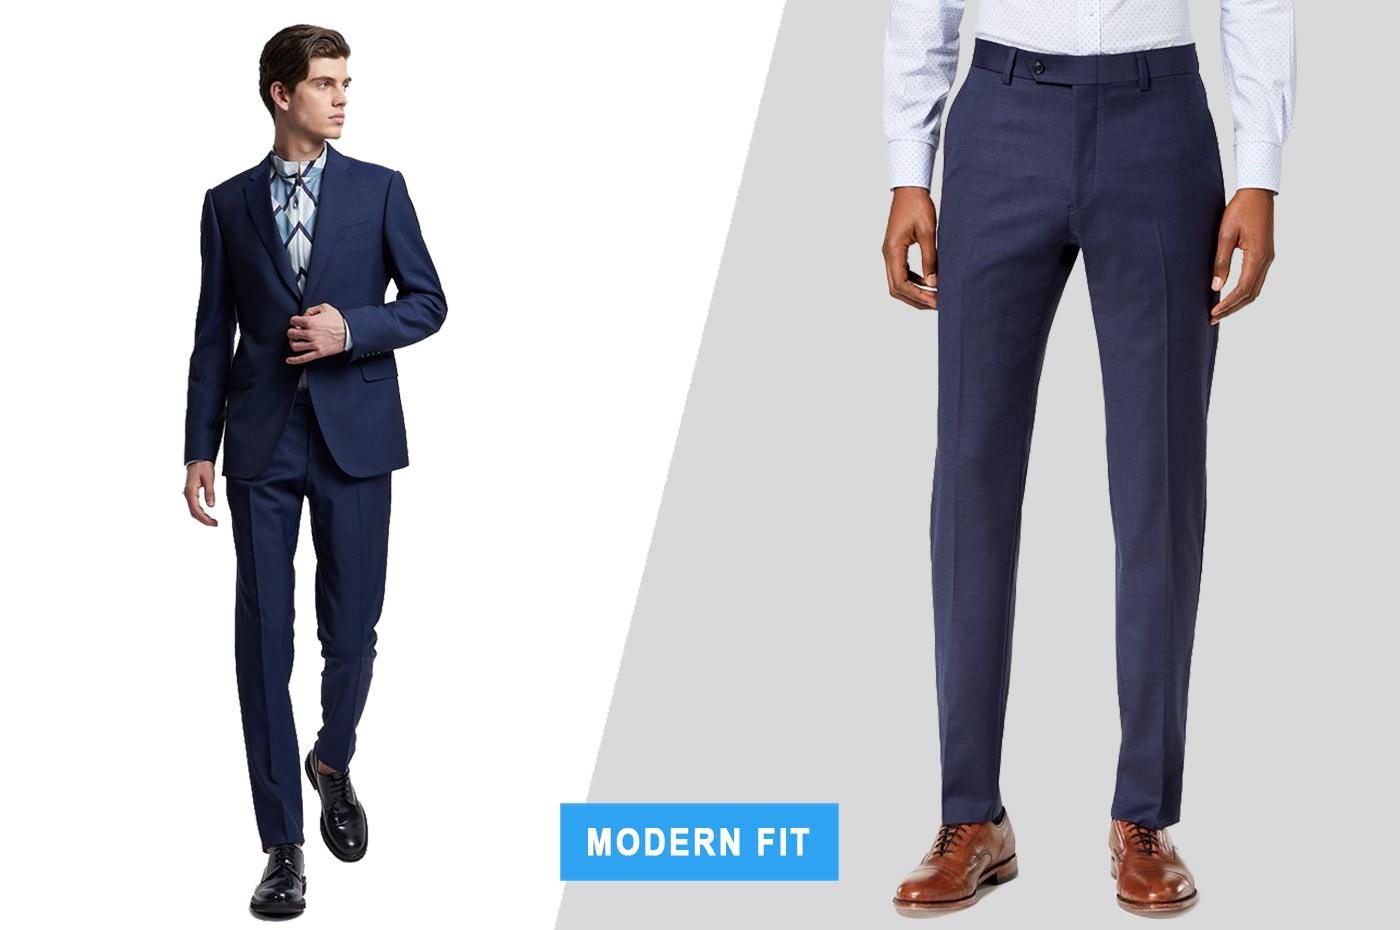 modern fit dress pants with suit